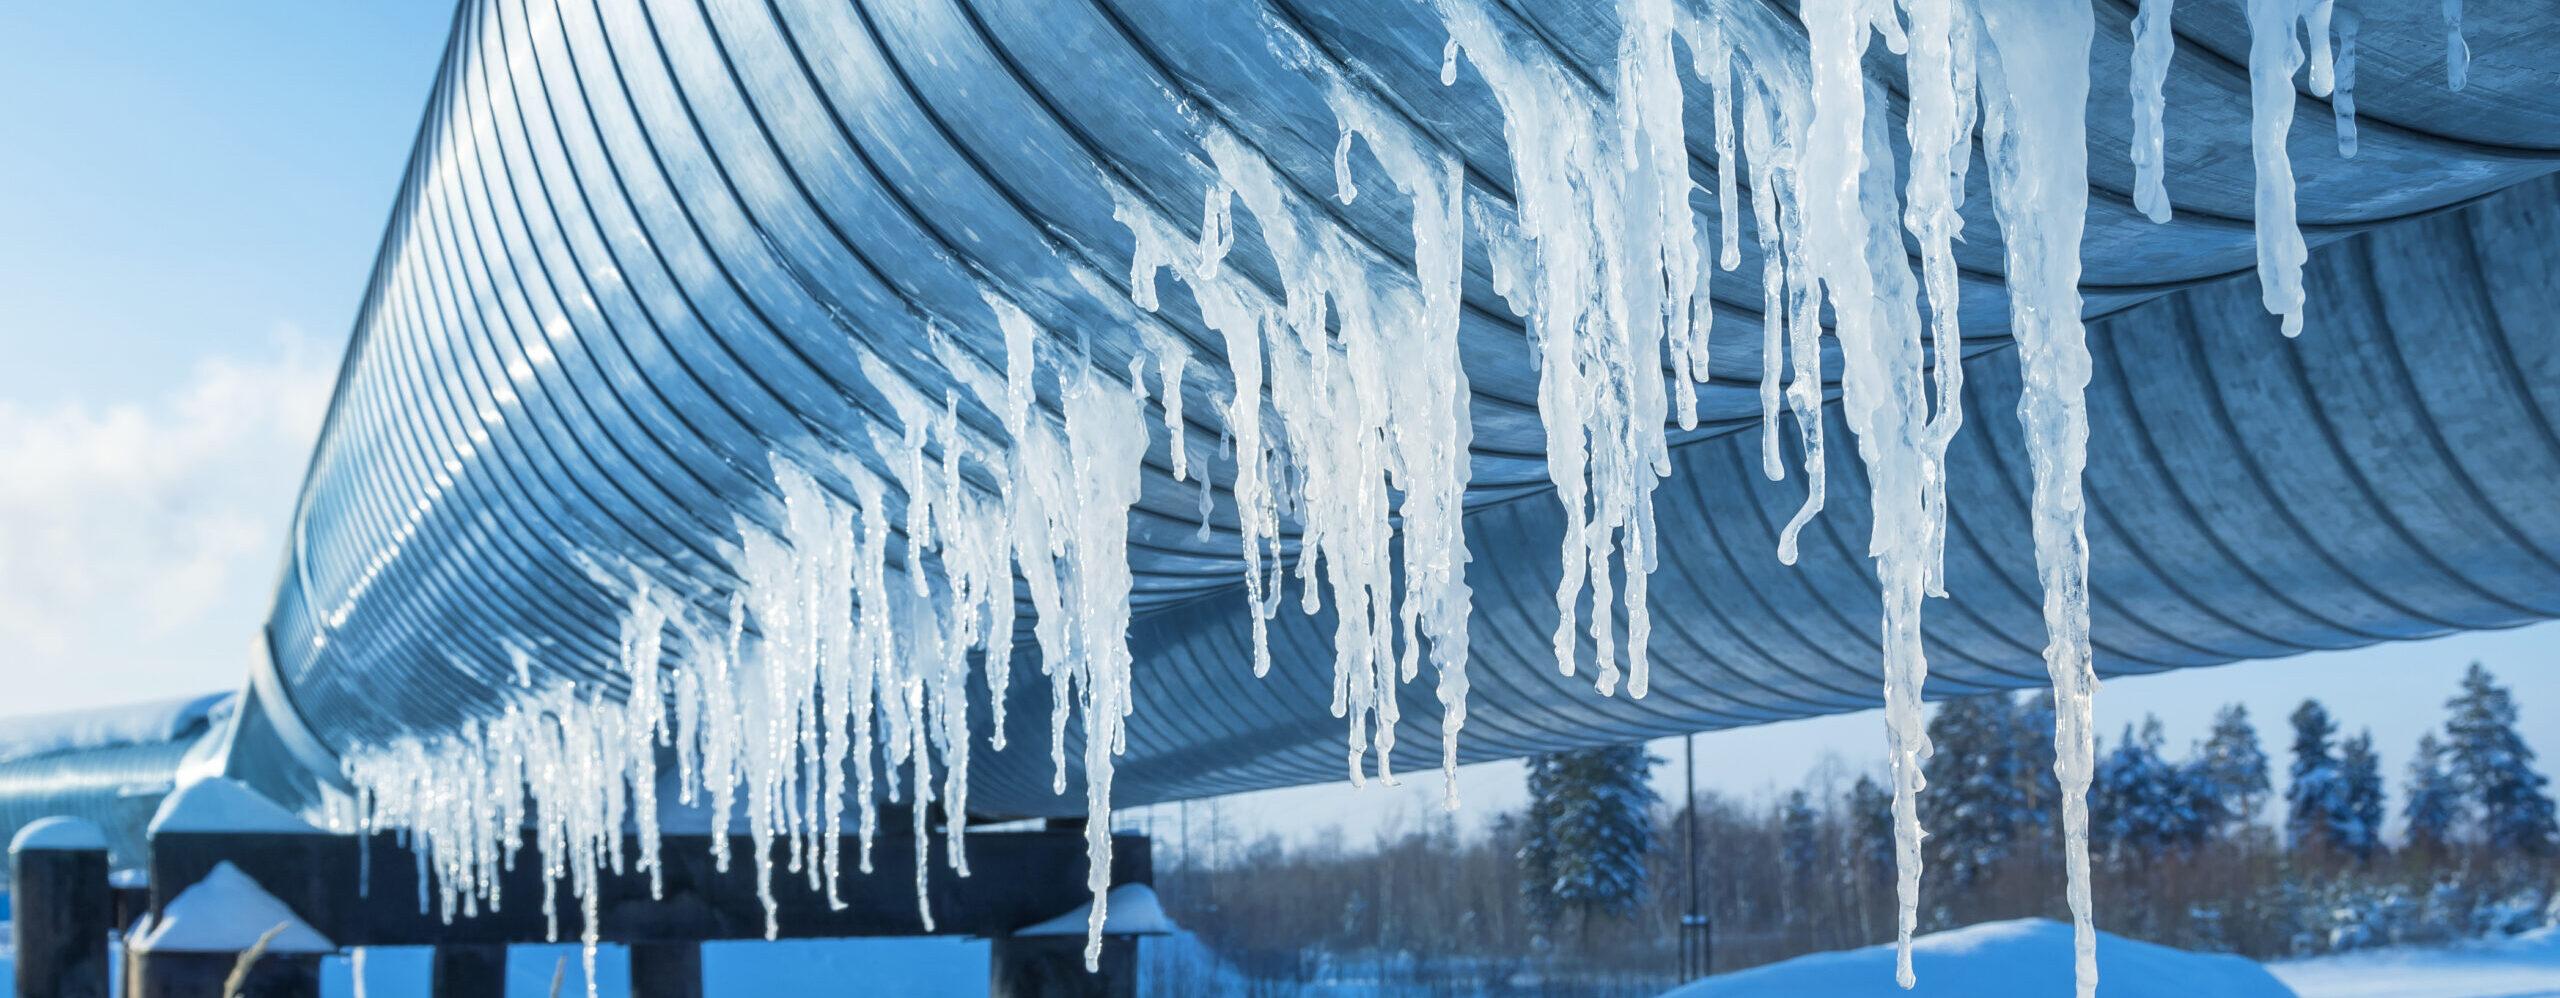 Frozen piping, Winterisation